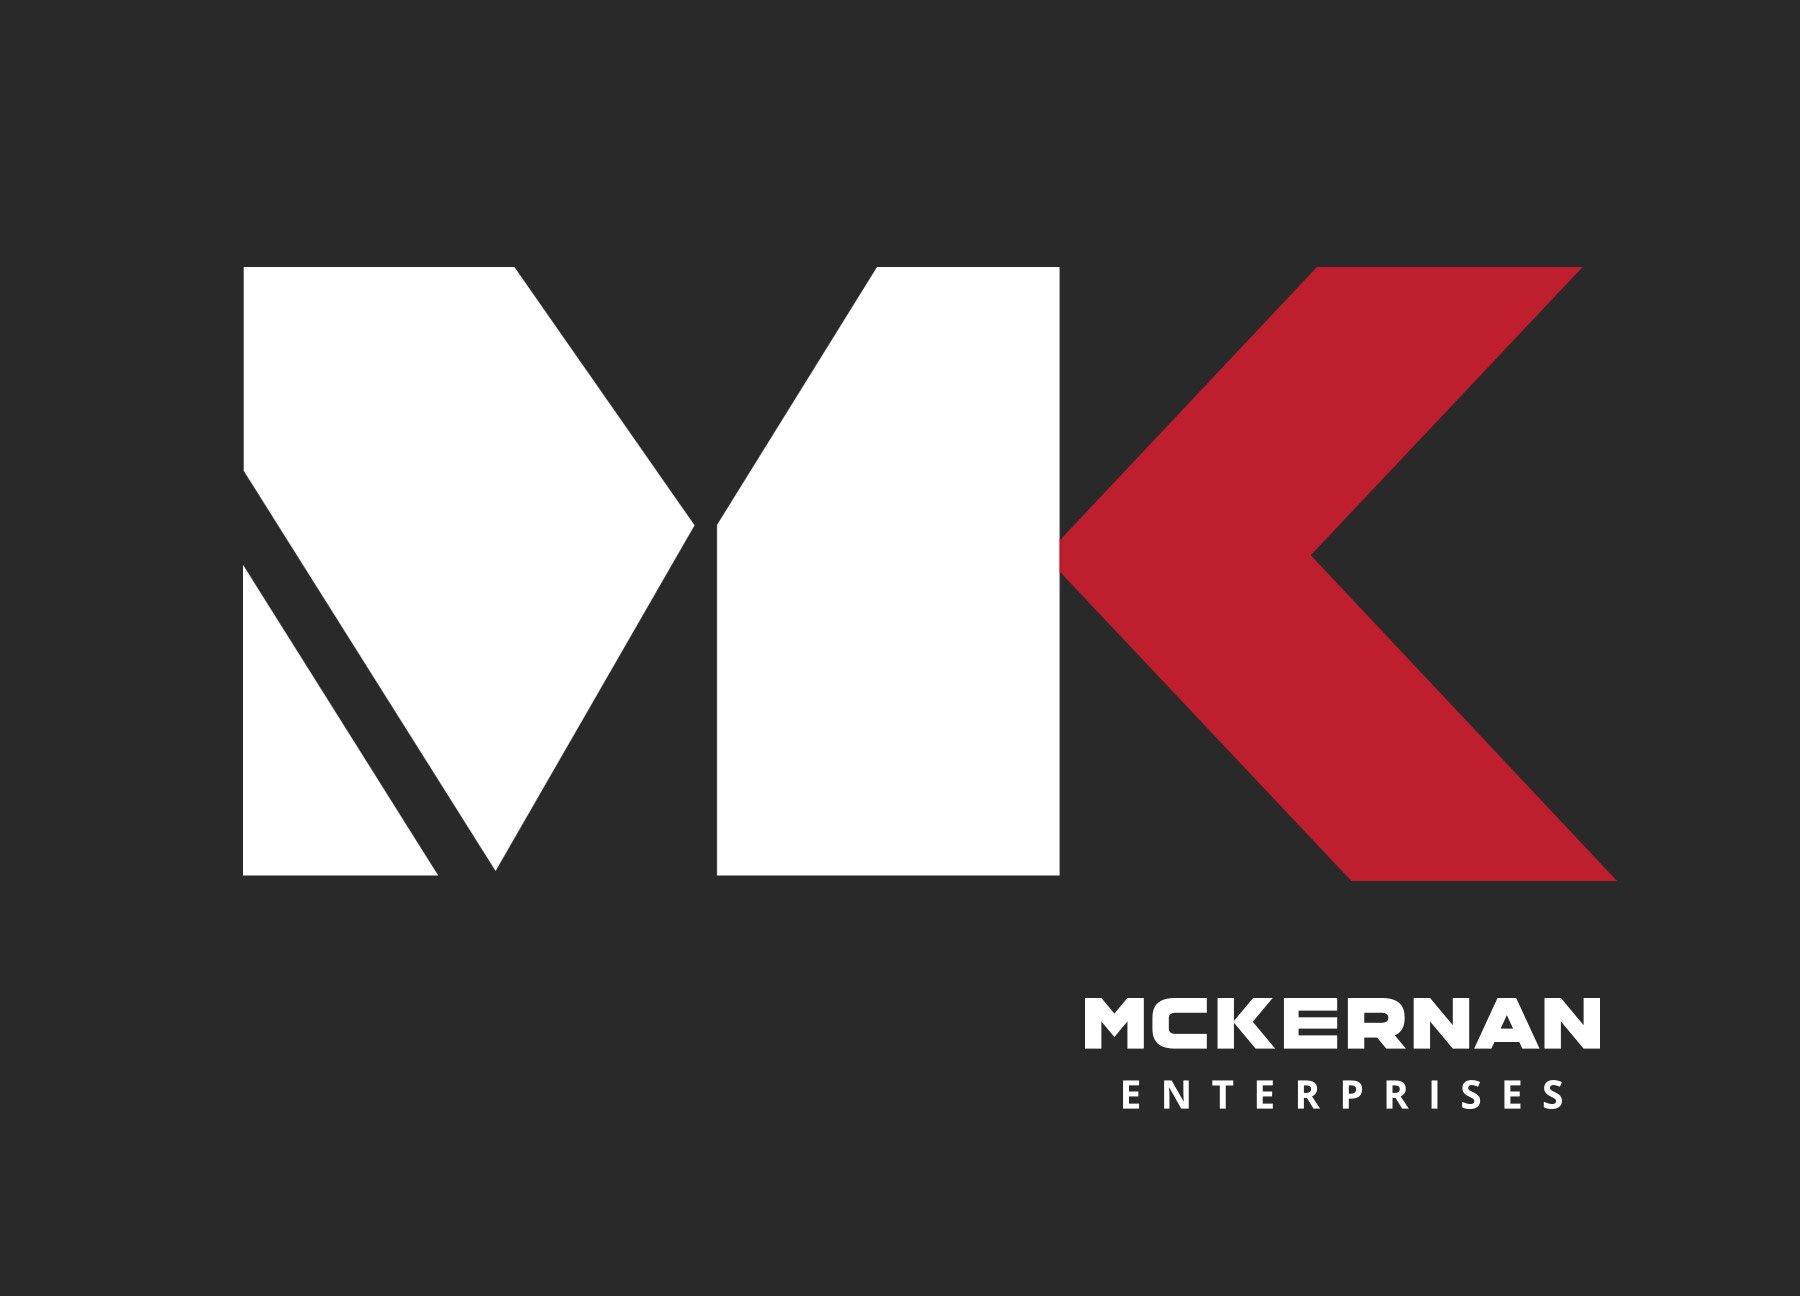 brand identity: mckernan